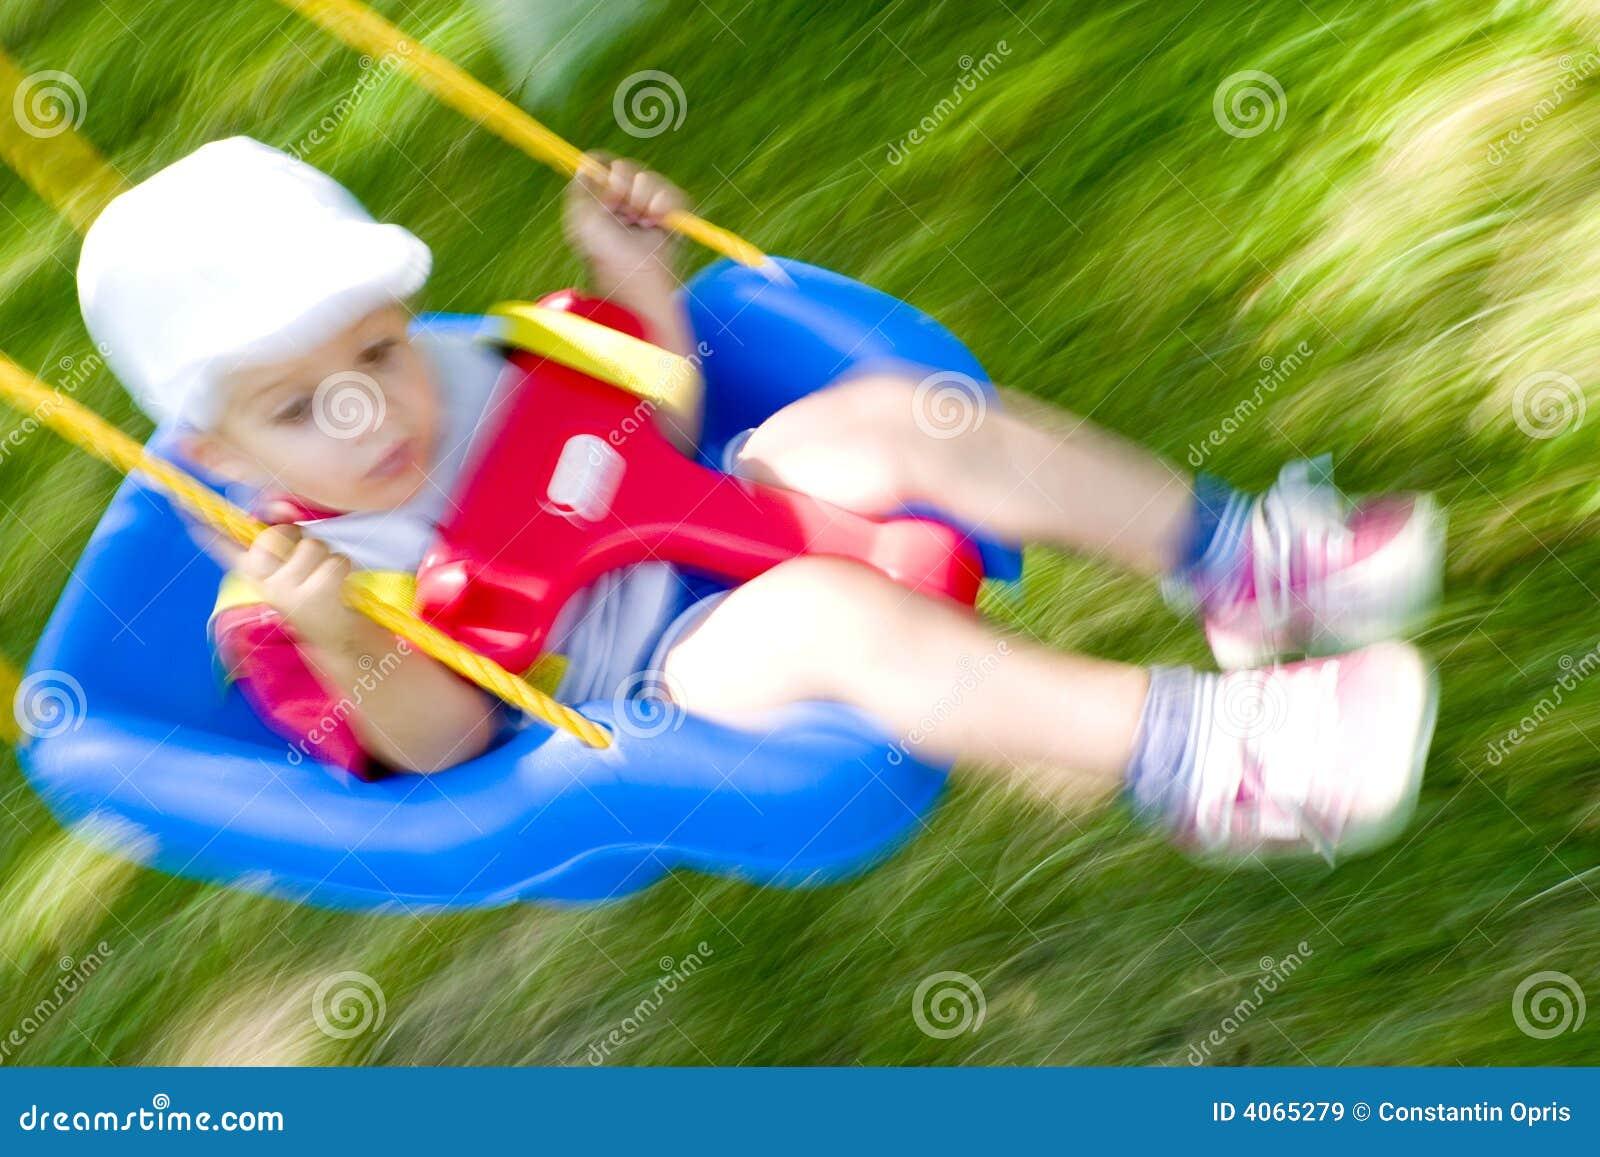 Garçon d enfant en bas âge dans l oscillation